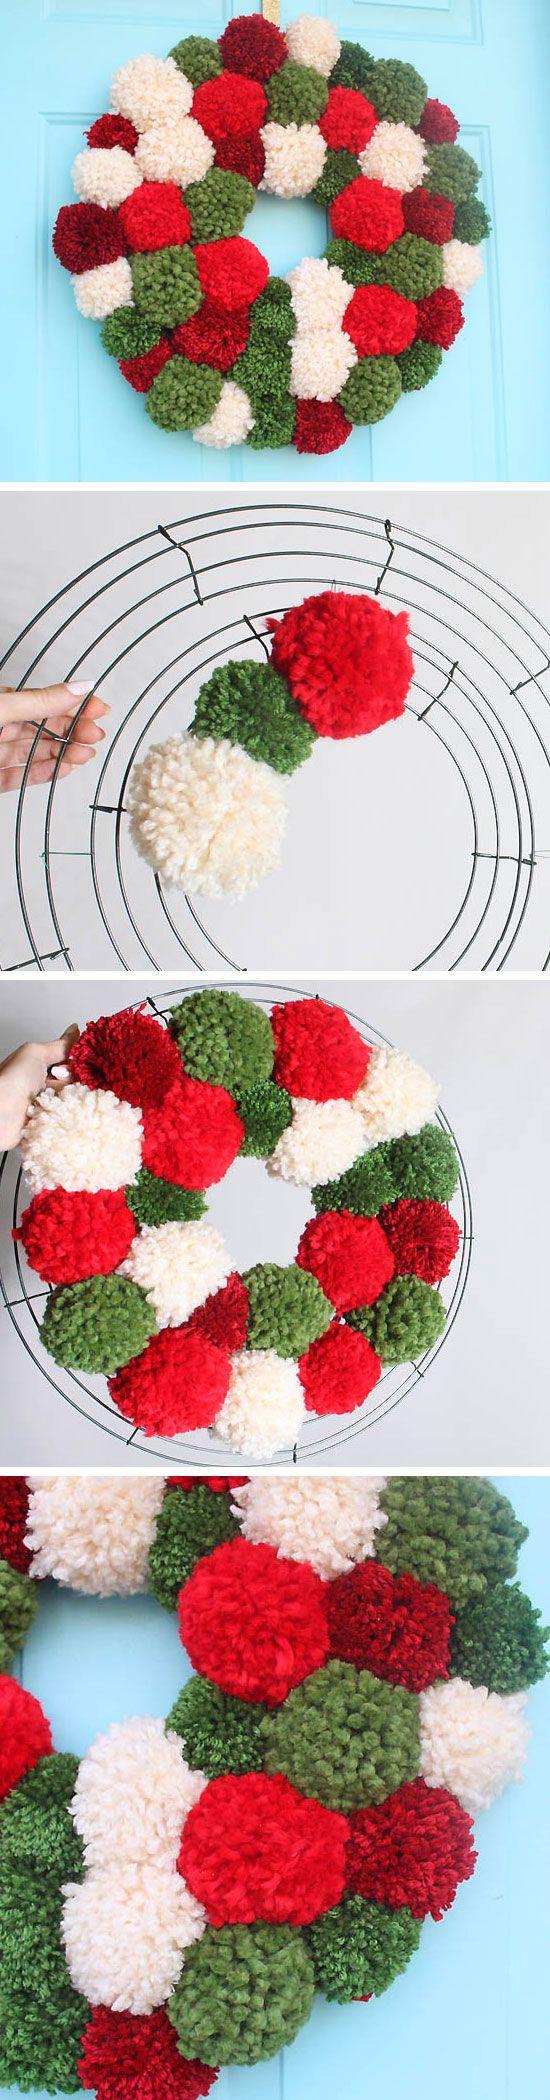 Garage door christmas decorations - 20 Super Easy Diy Christmas Wreaths